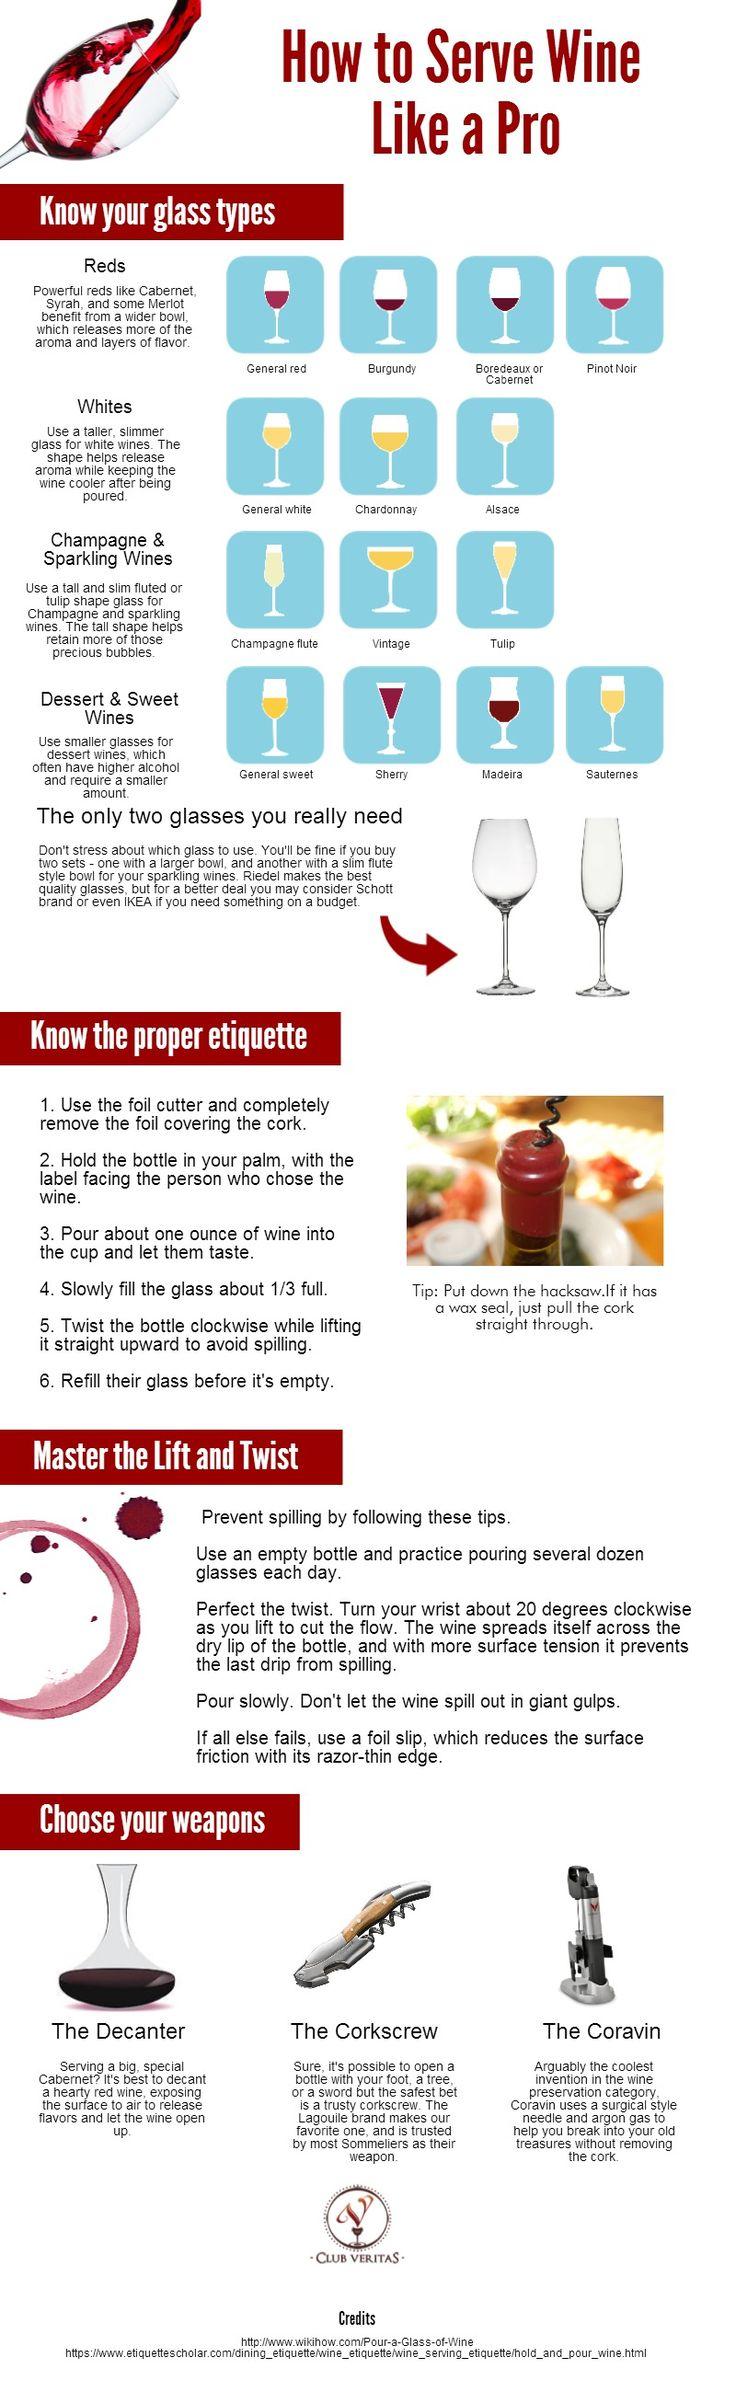 http://clubveritas.com/pressed/how-serve-wine-like-pro/